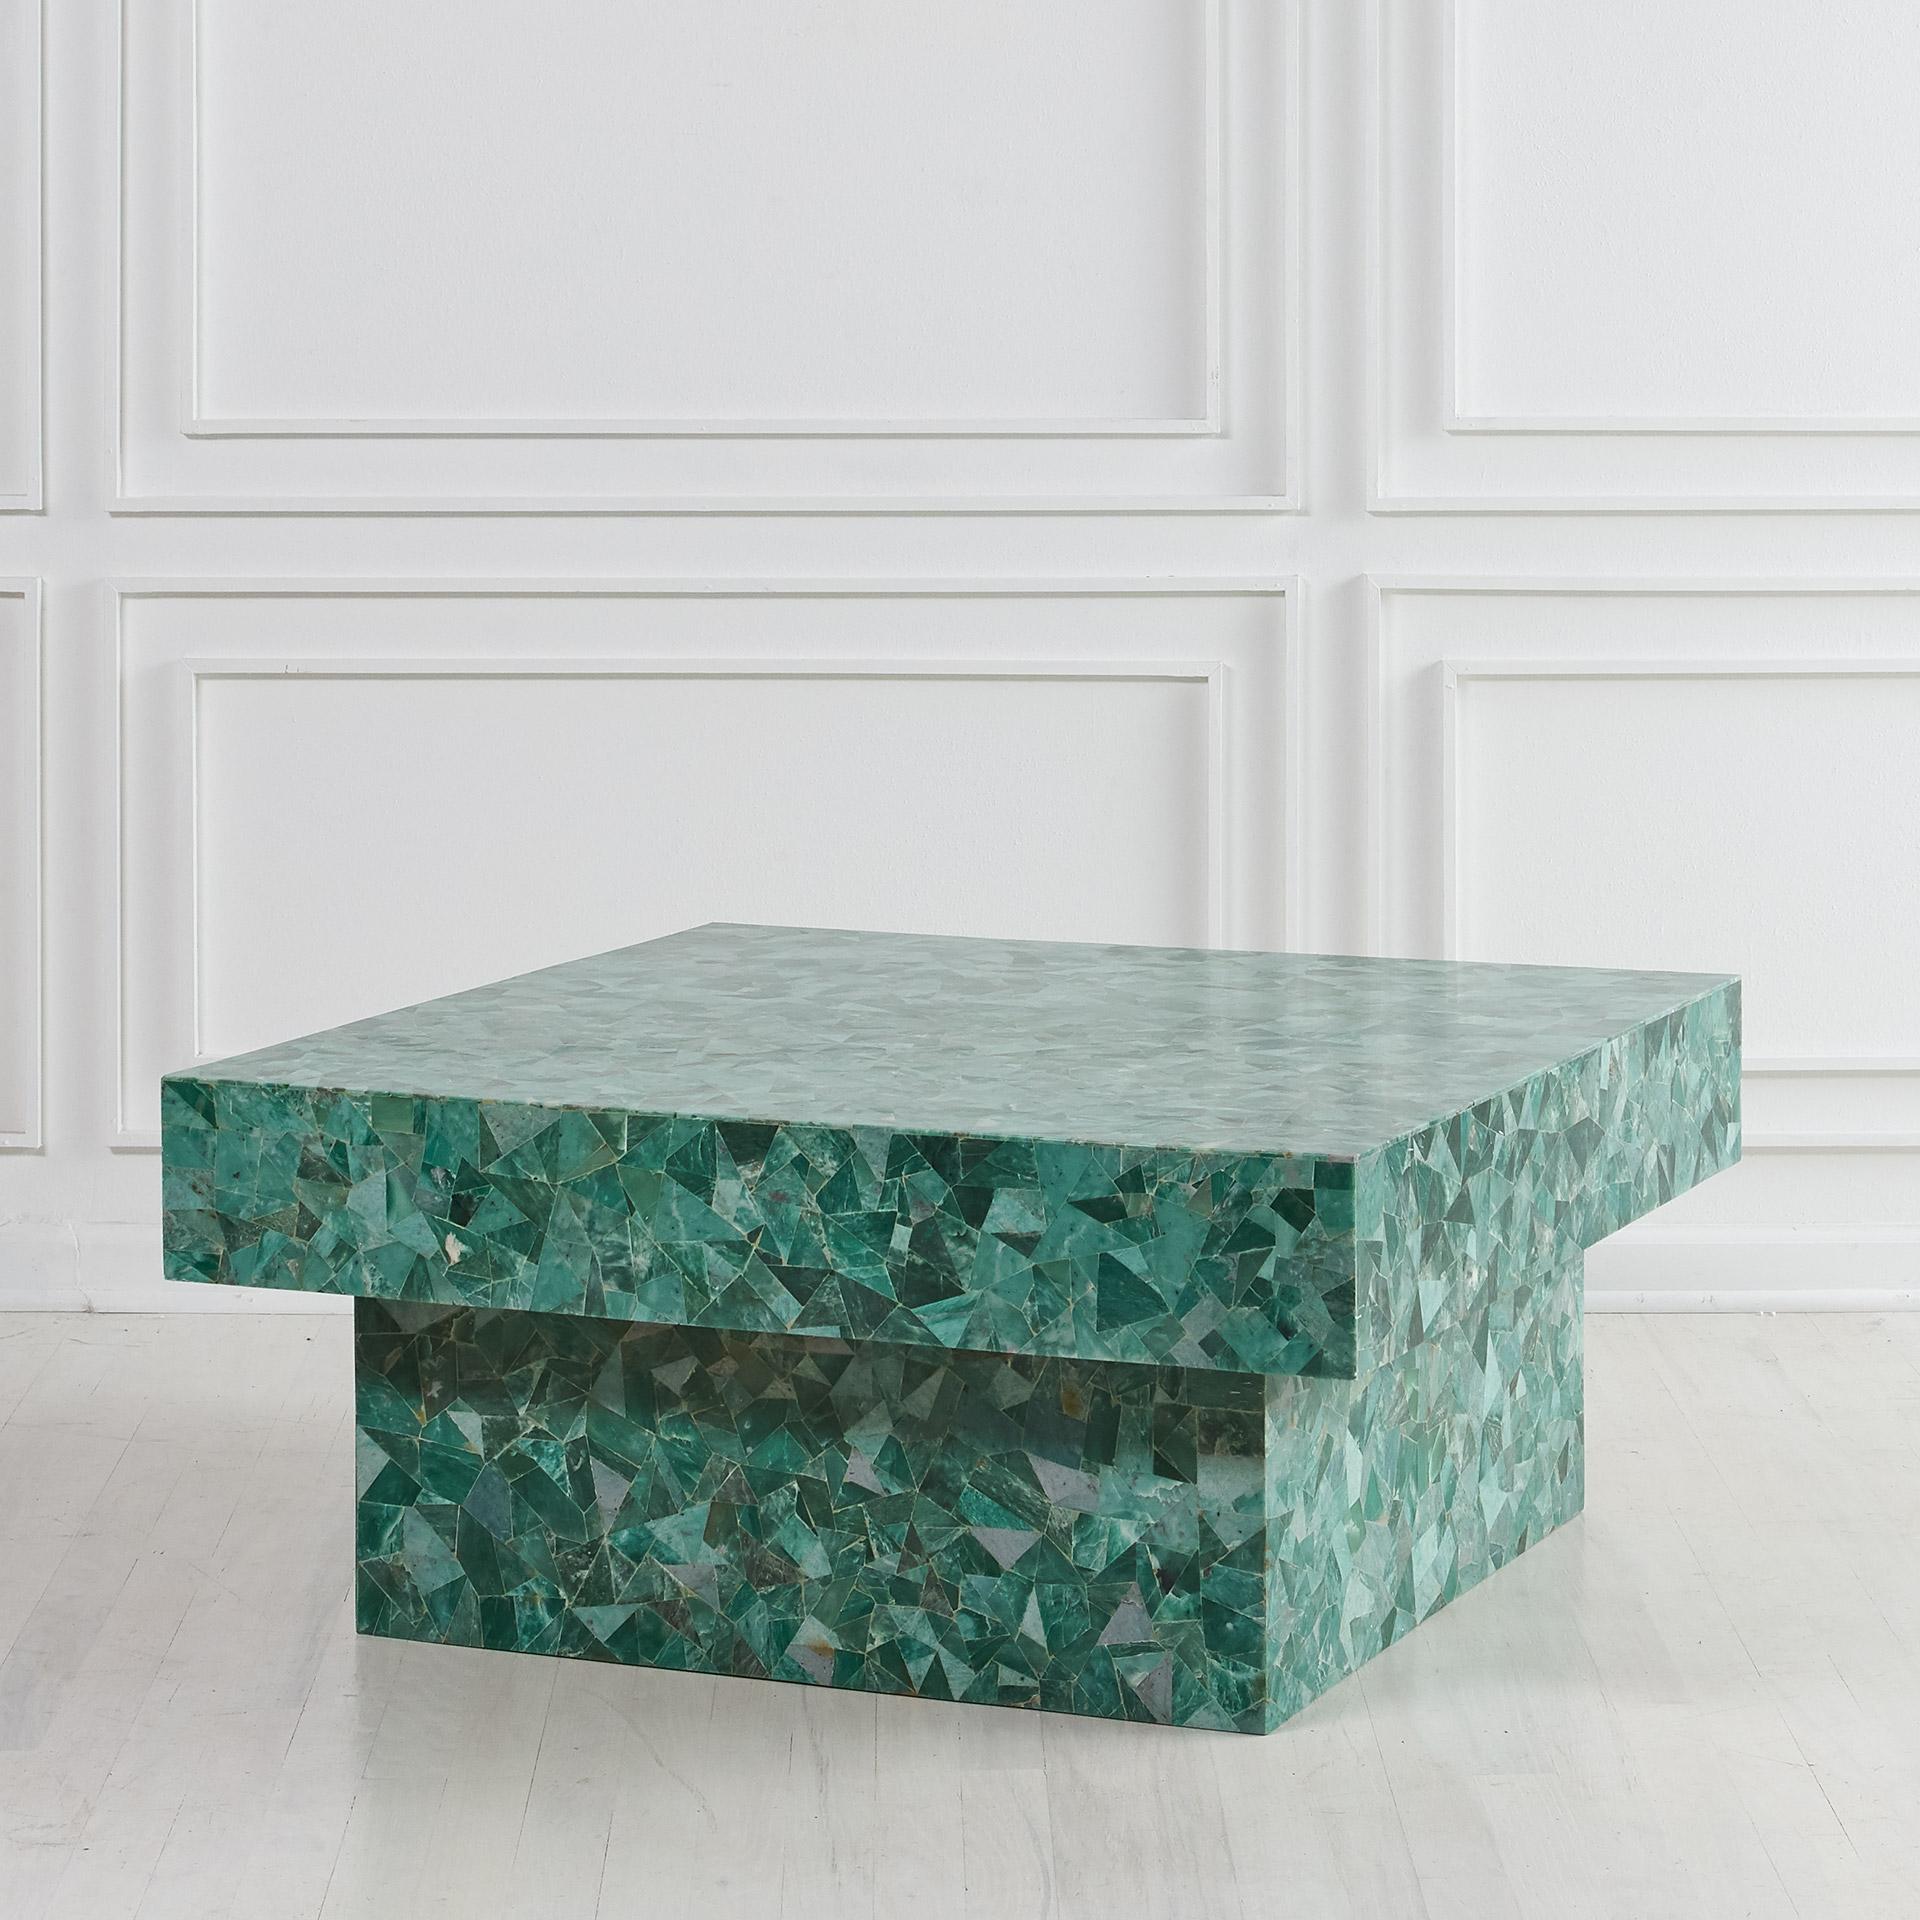 Green Marble Mosaic Coffee Table South Loop Loft